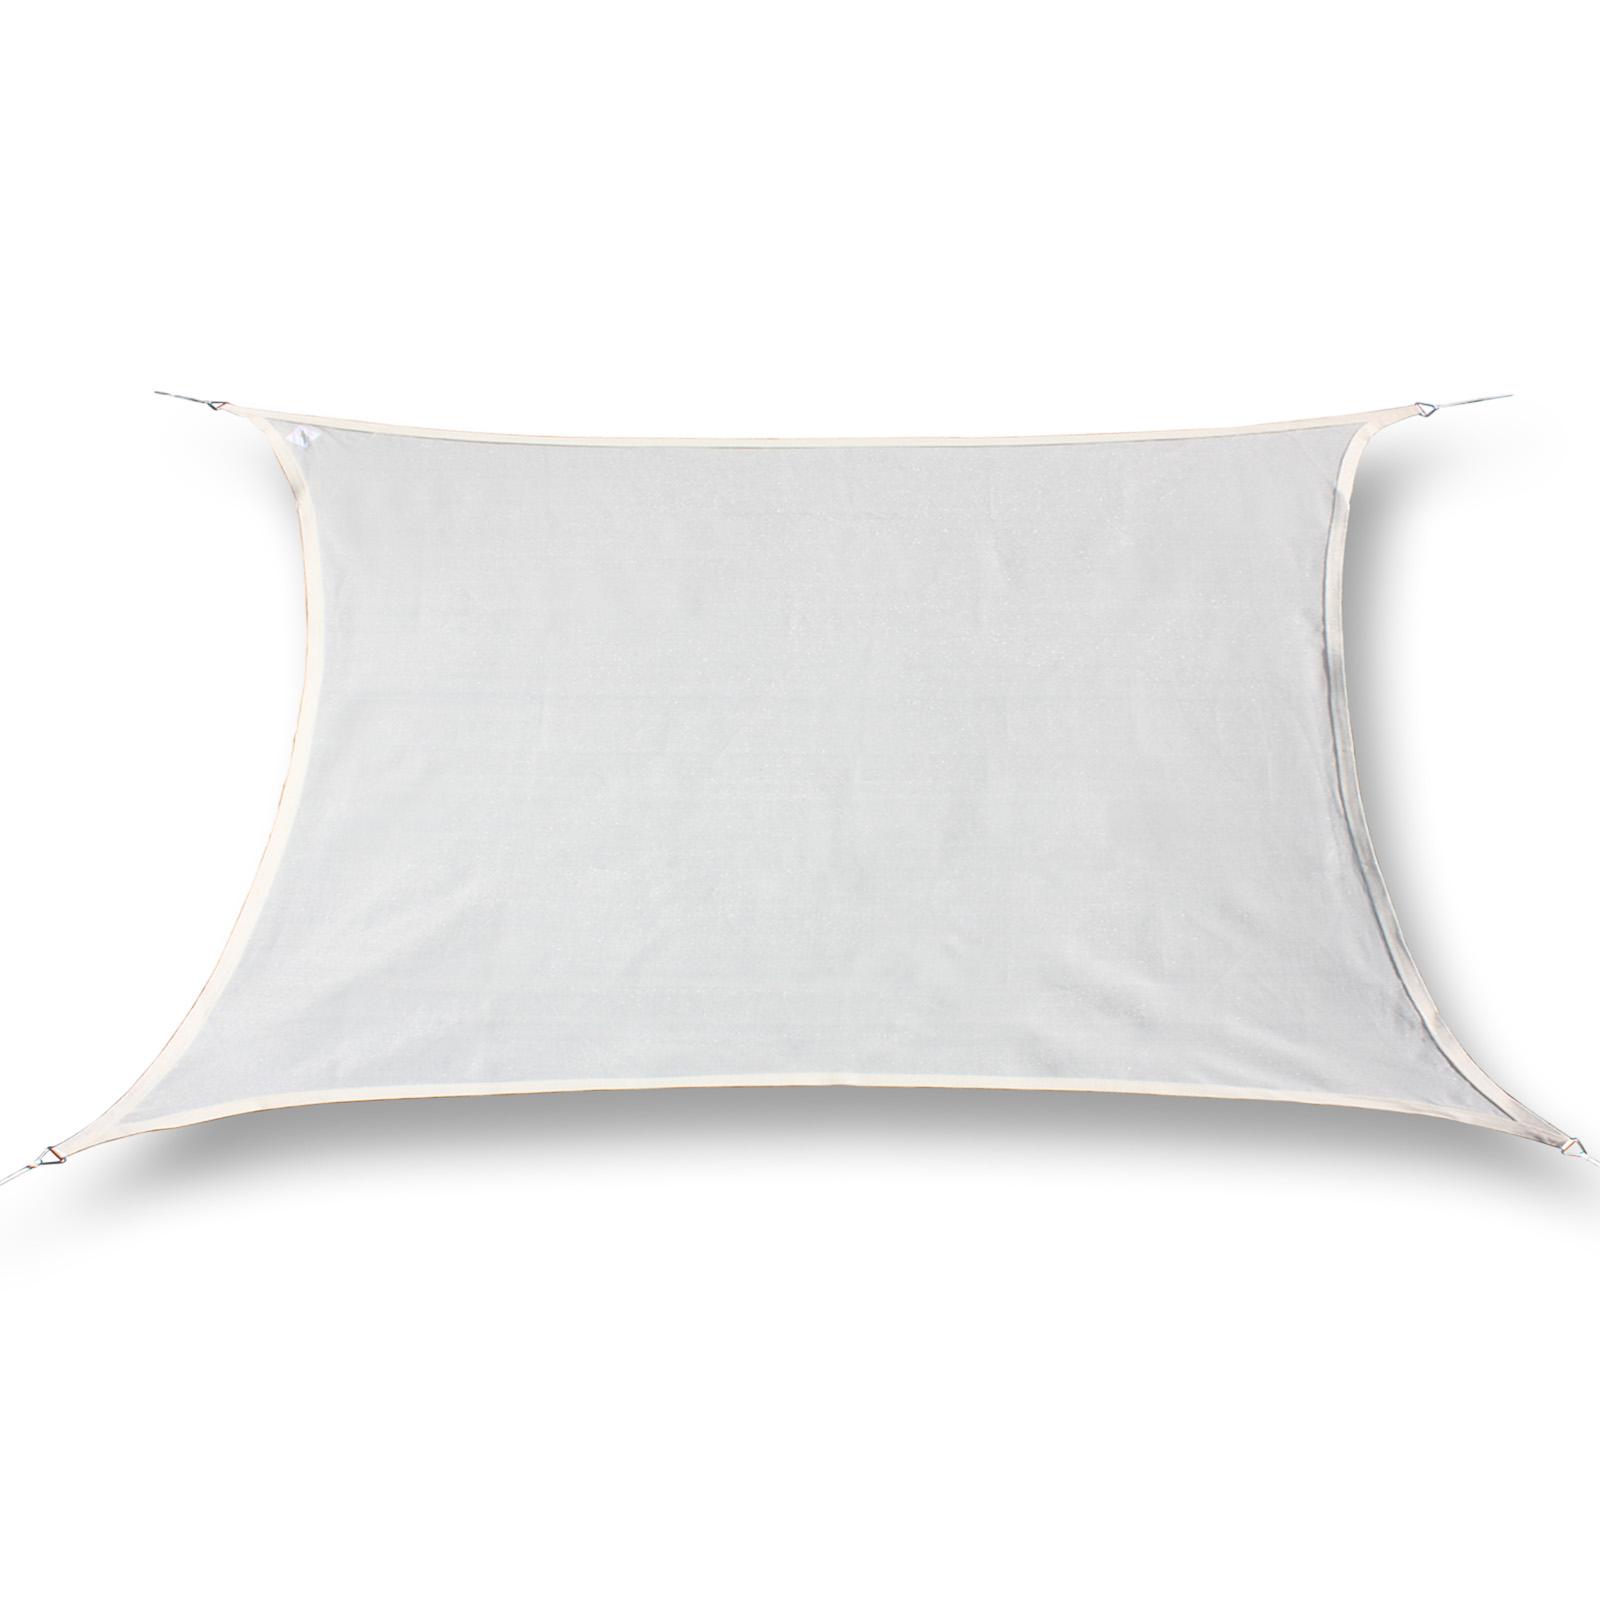 sonnensegel wasserdicht rechteck 2x4m 3 farben garten. Black Bedroom Furniture Sets. Home Design Ideas